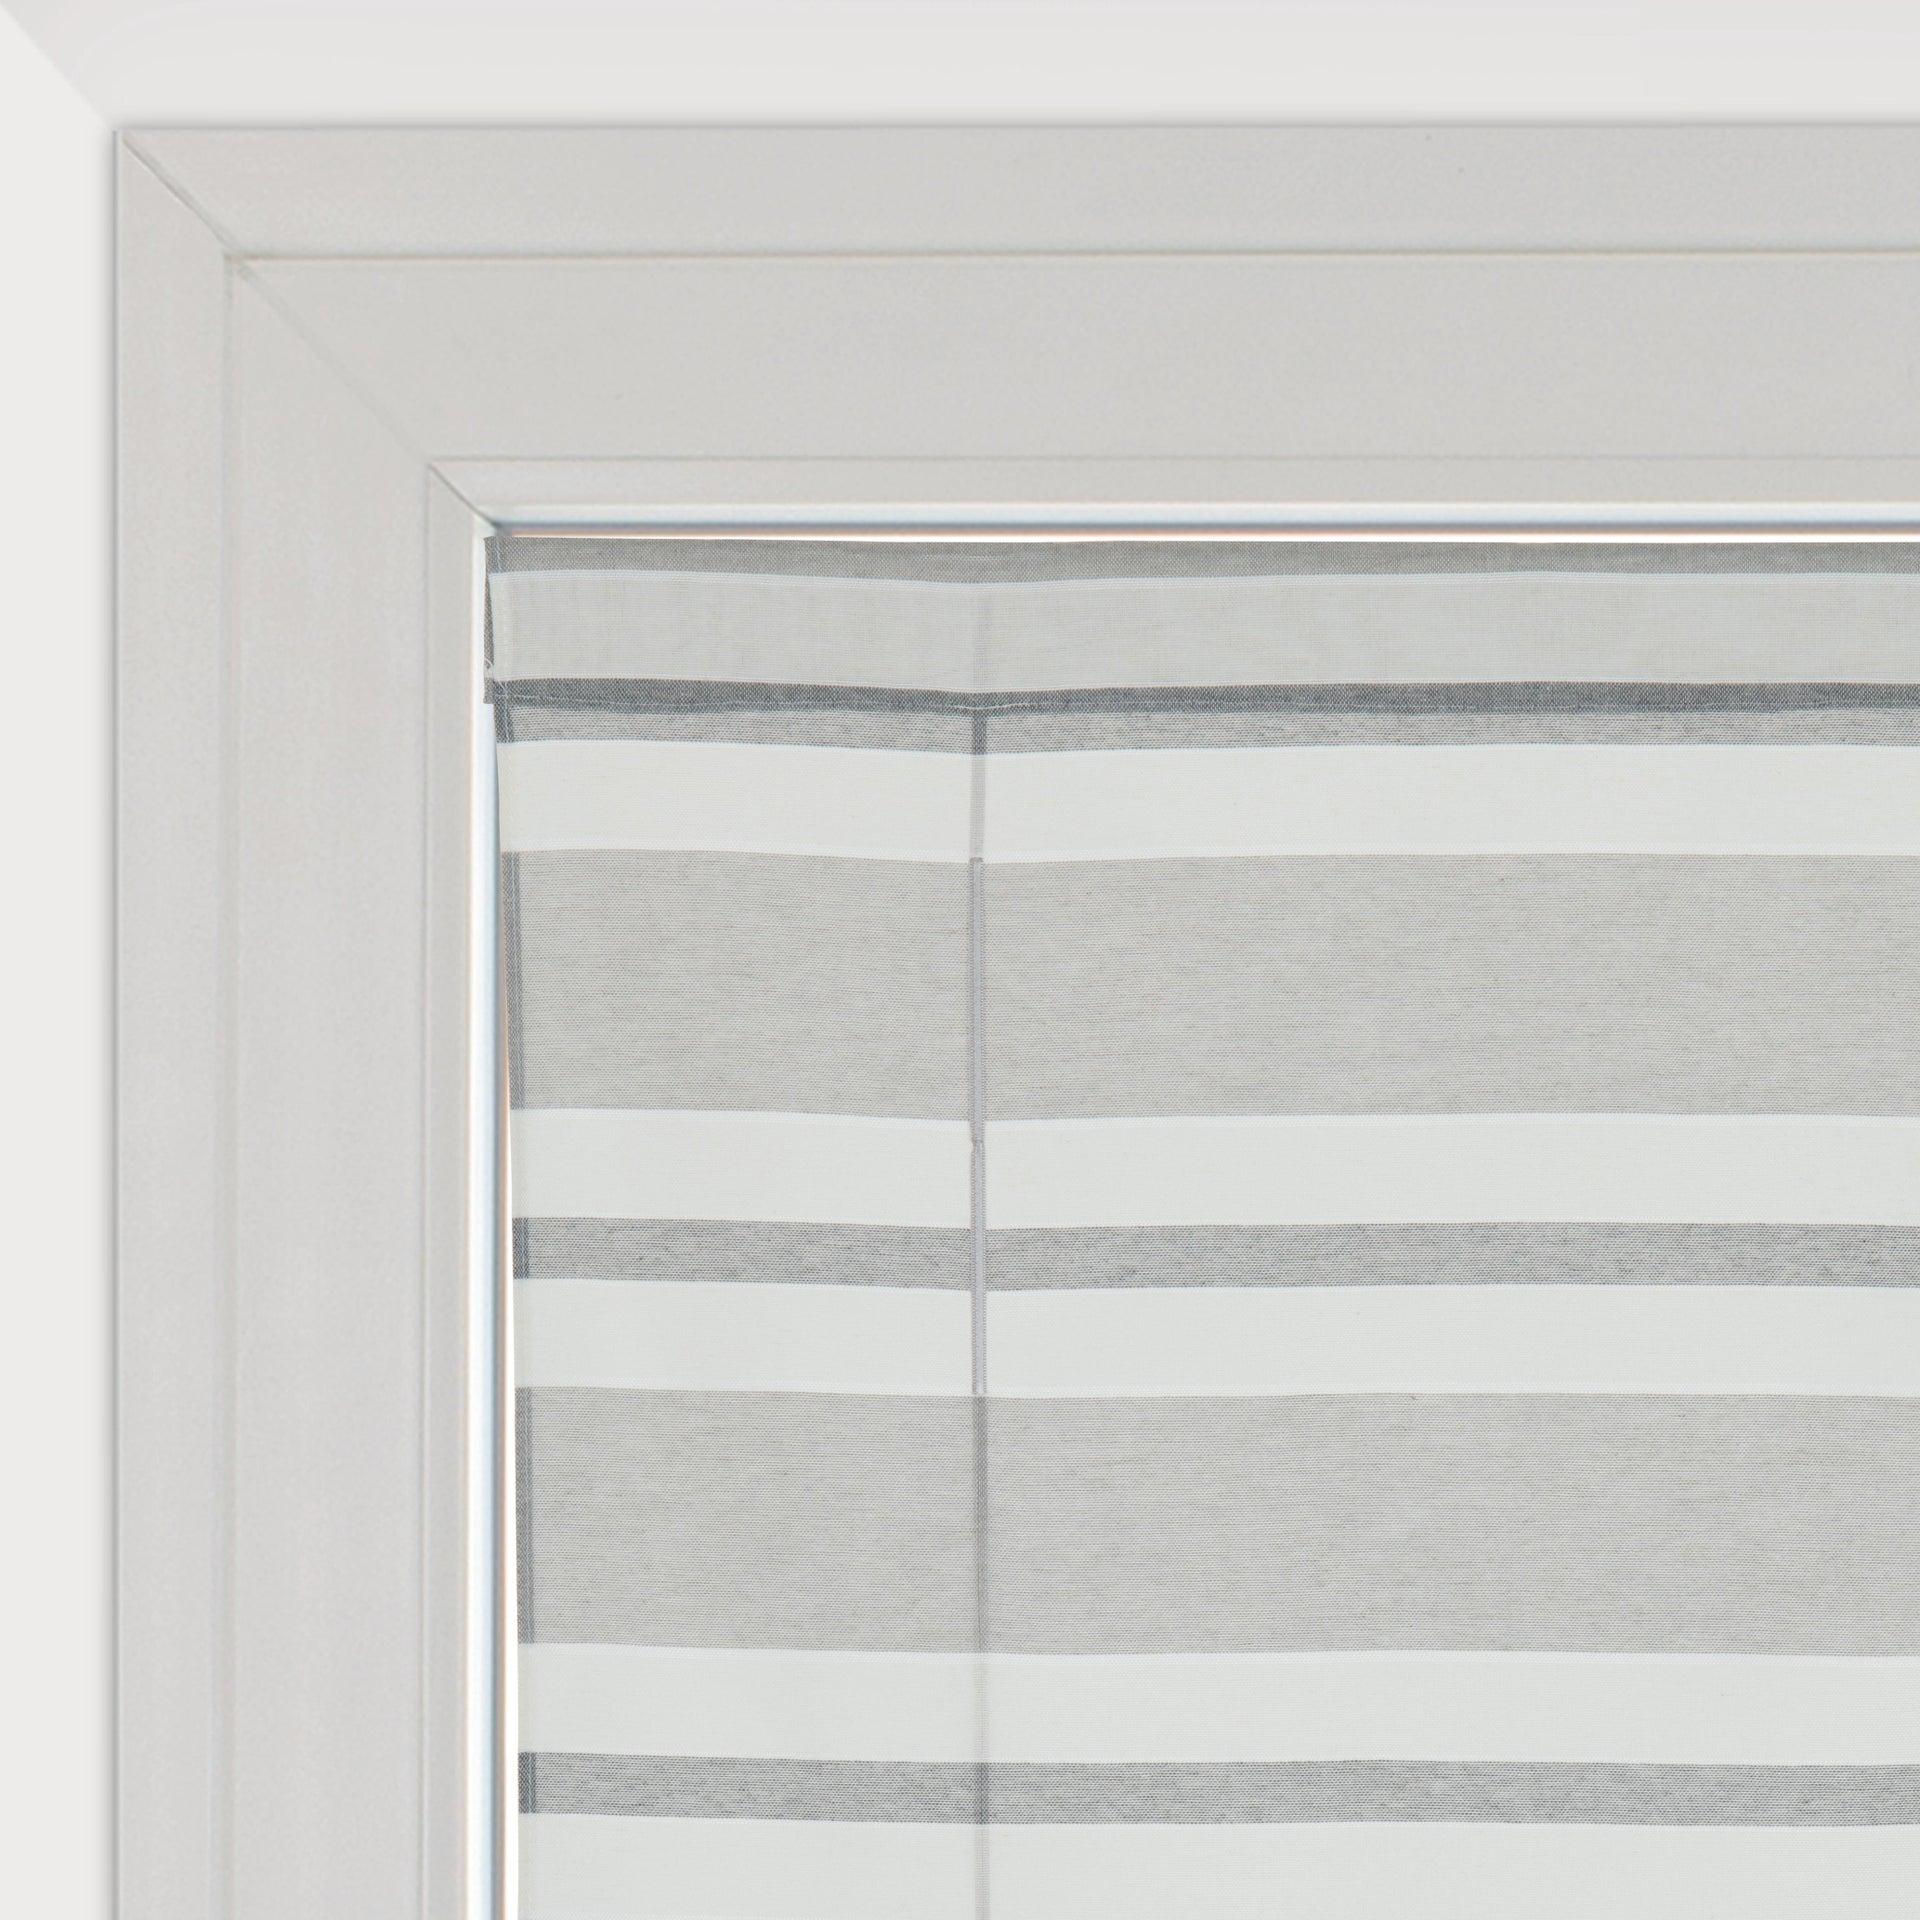 Tendina vetro Peggy grigio tunnel 58 x 175 cm - 1